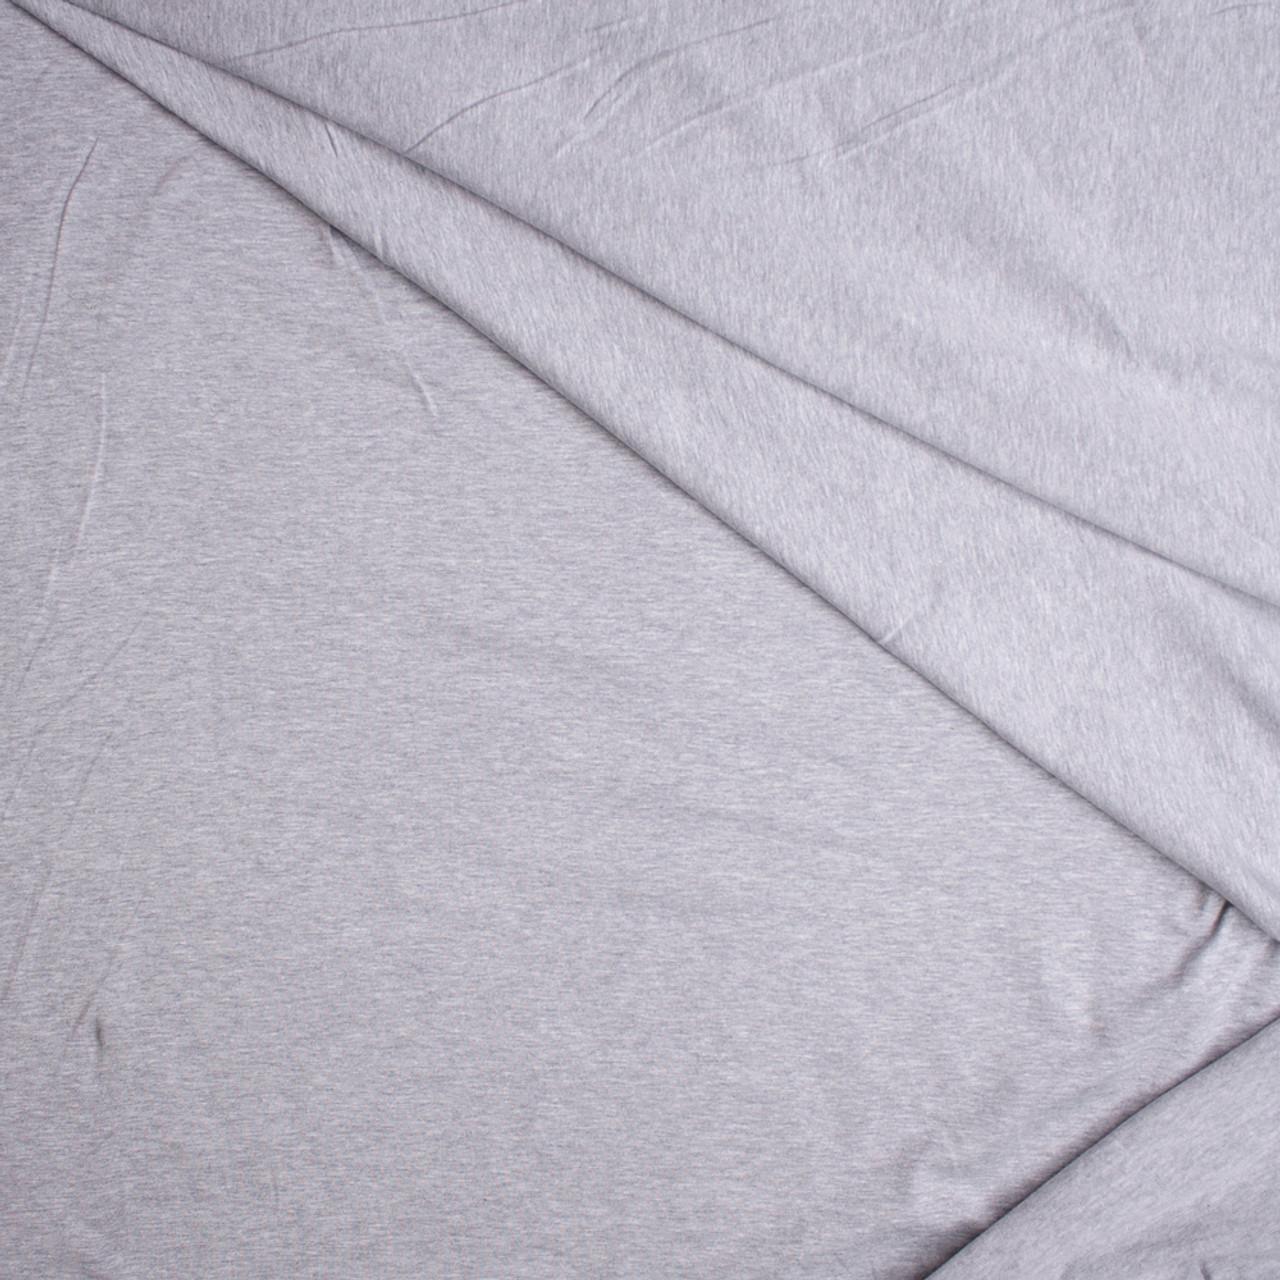 a60f0ebb755 ... Heather Grey Stretch Cotton Knit Fabric By The Yard - Wide shot